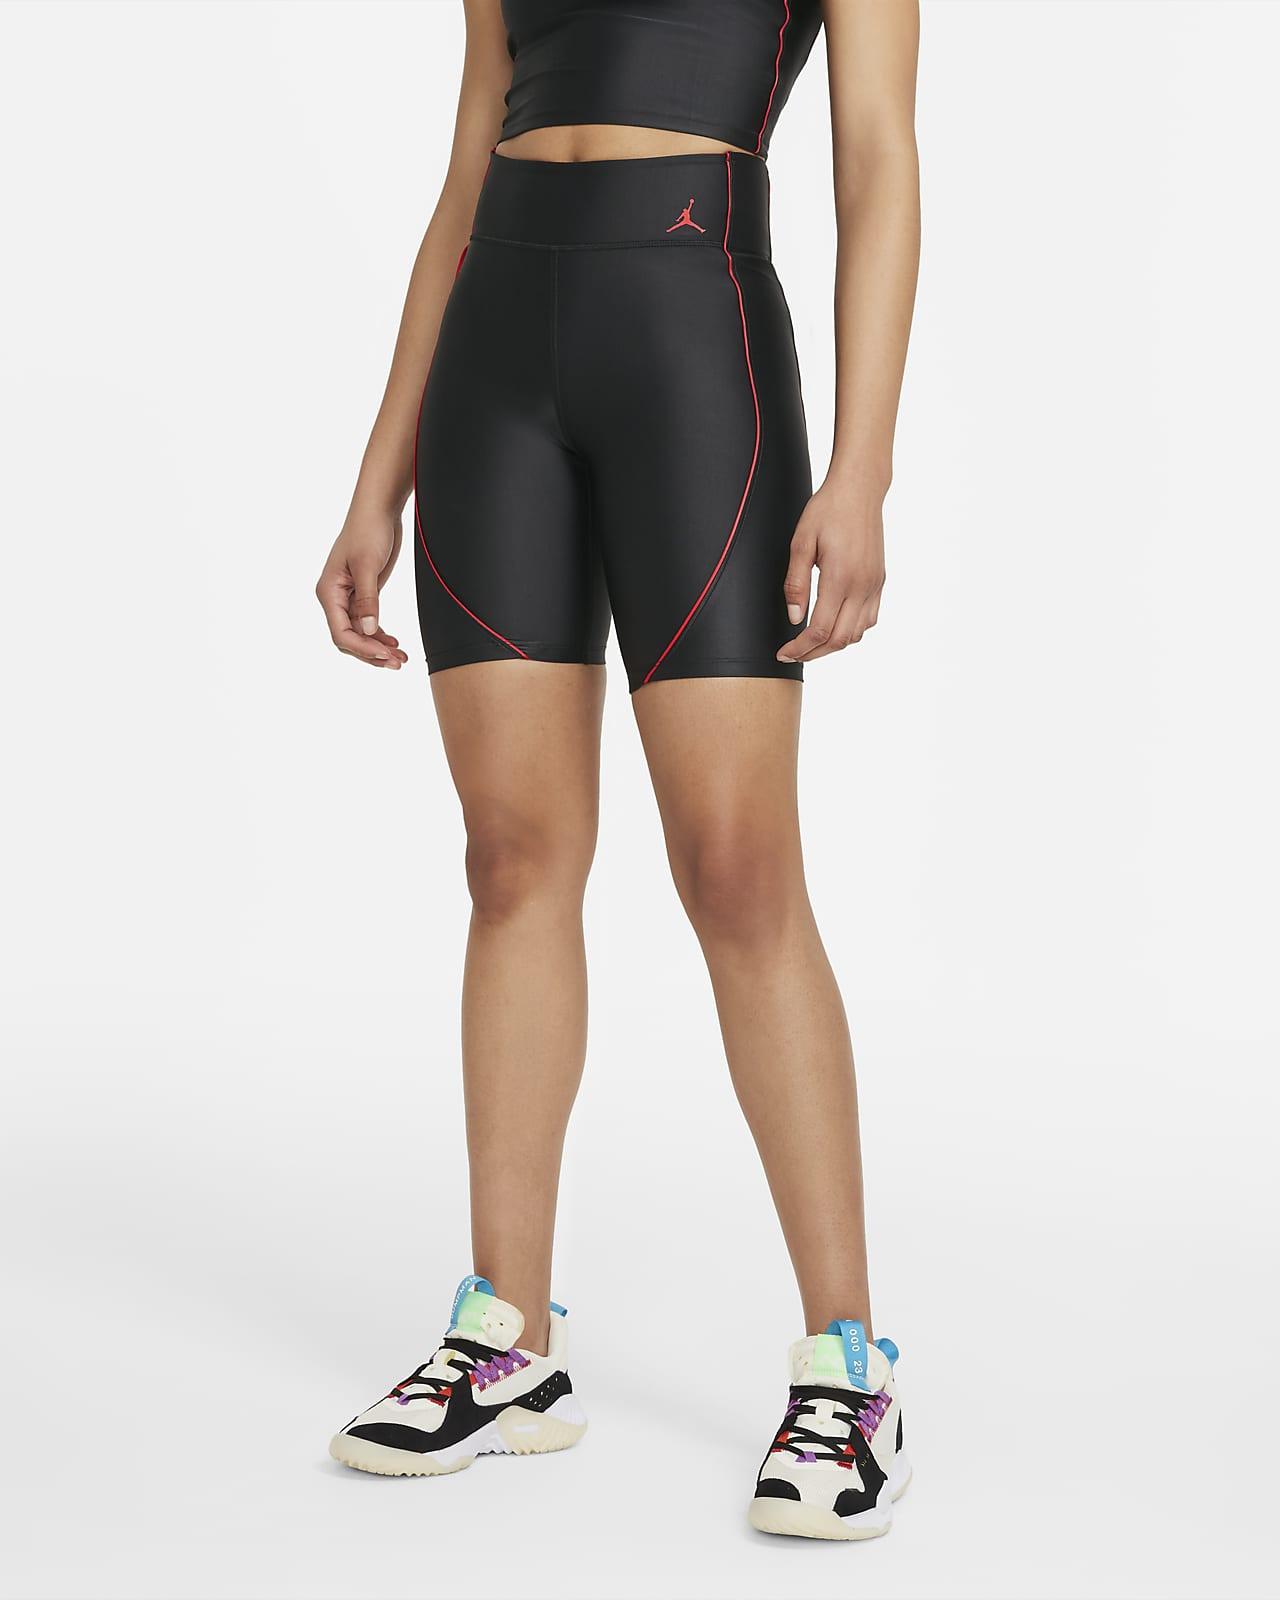 Jordan Essentials Women's Mid-Rise Bike Shorts